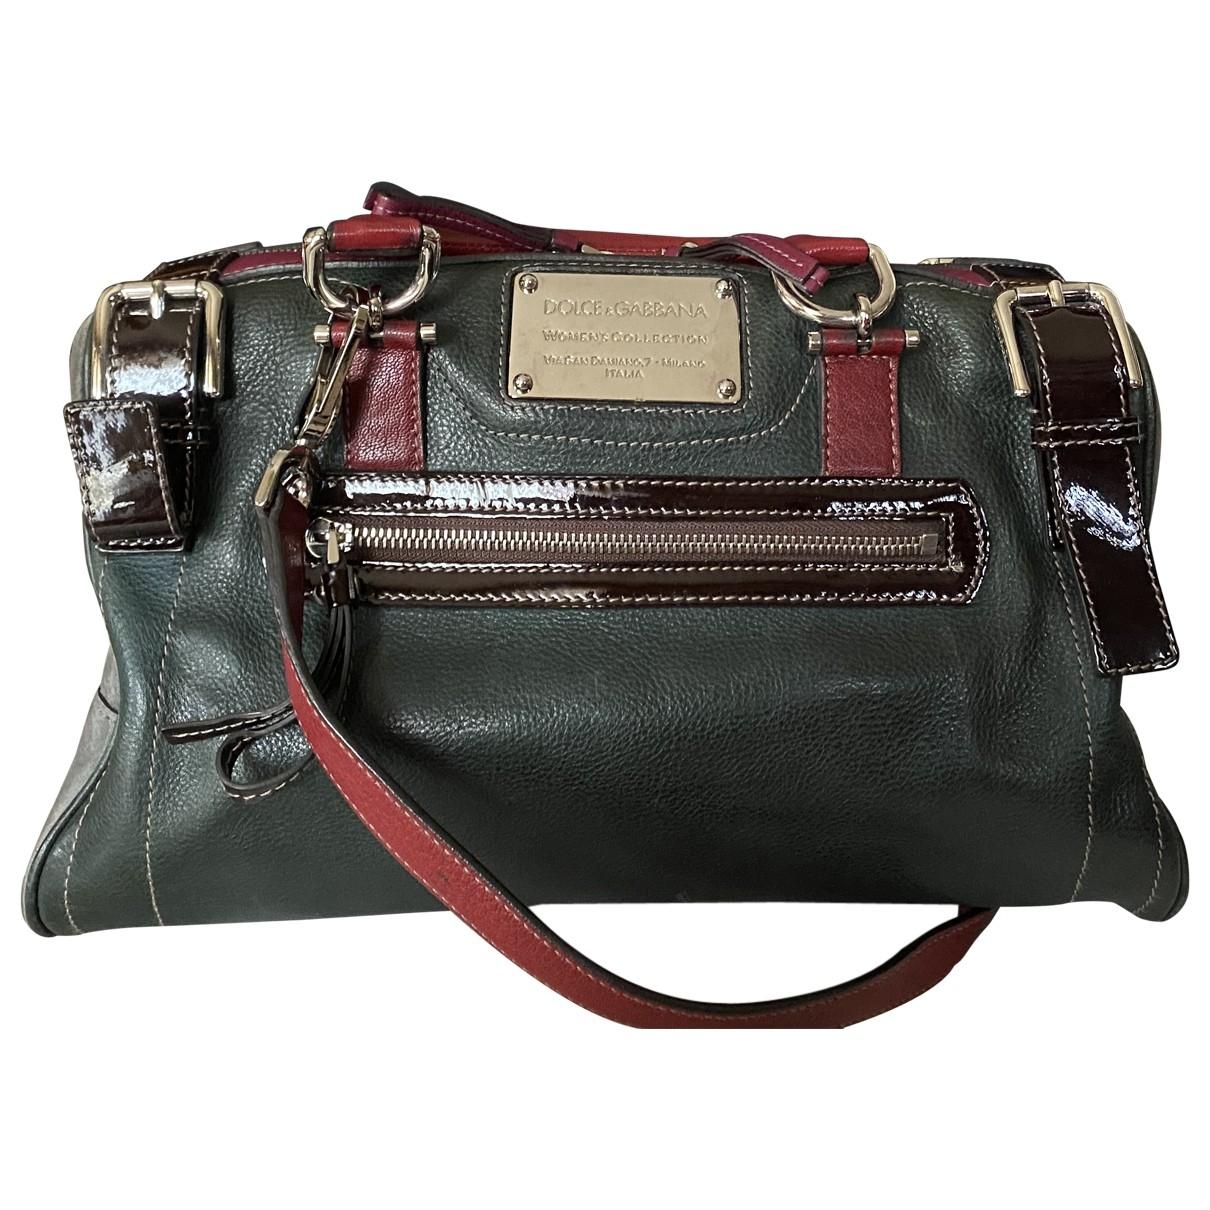 Dolce & Gabbana \N Green Leather handbag for Women \N